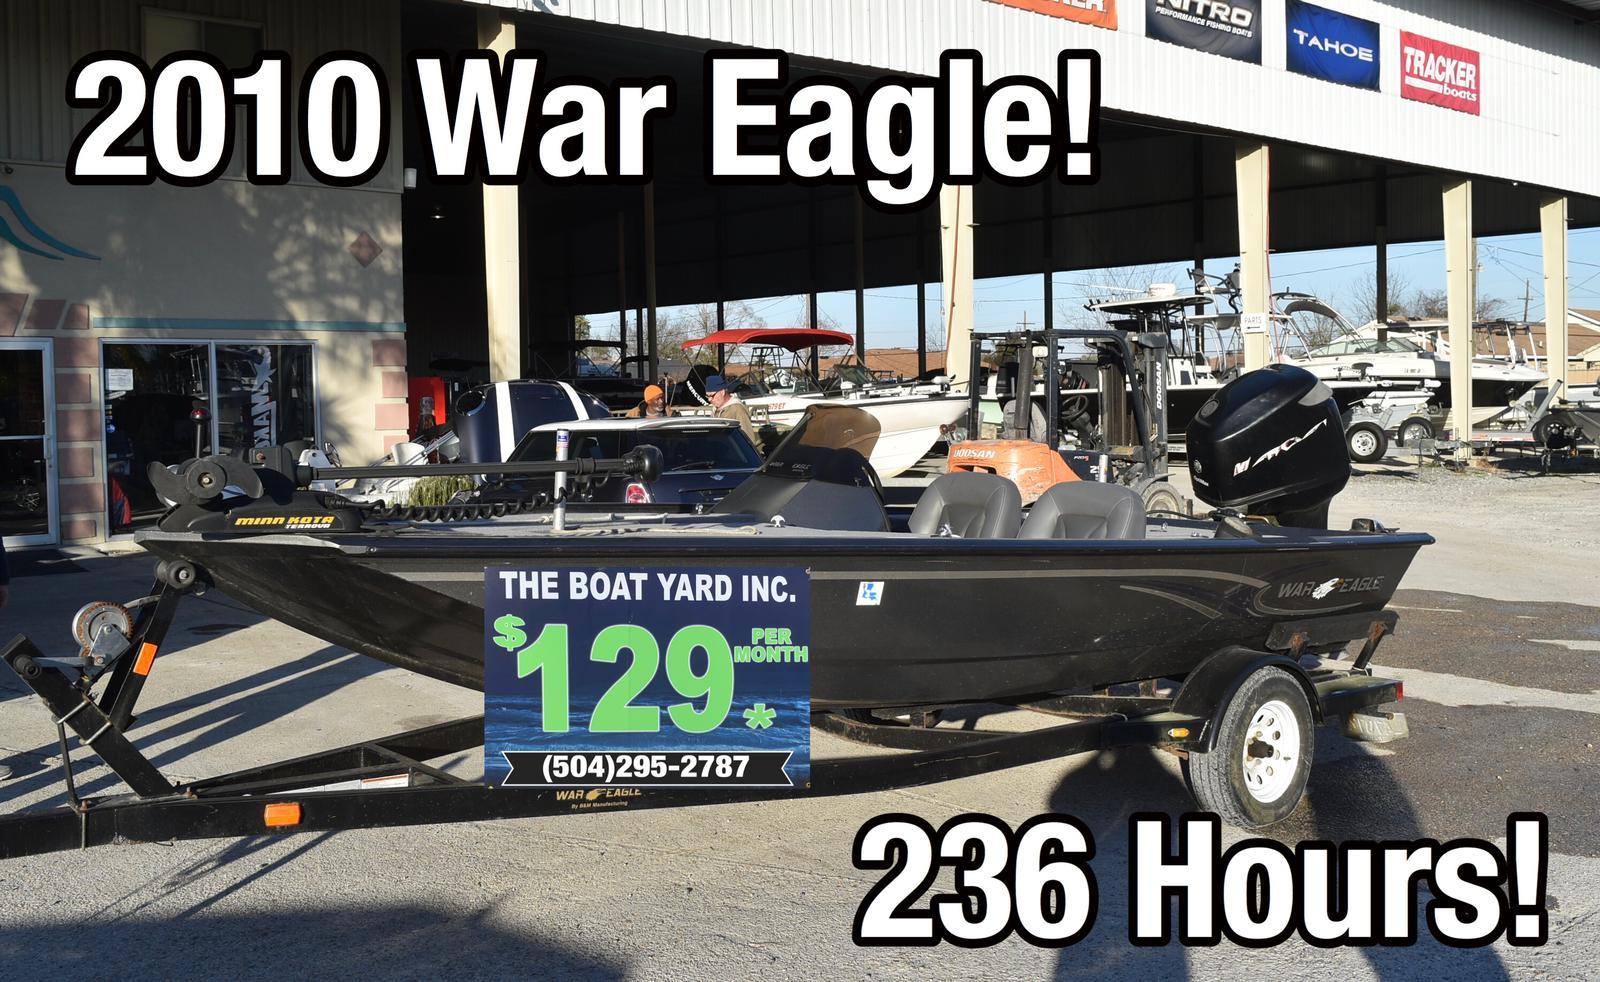 War Eagle 756T